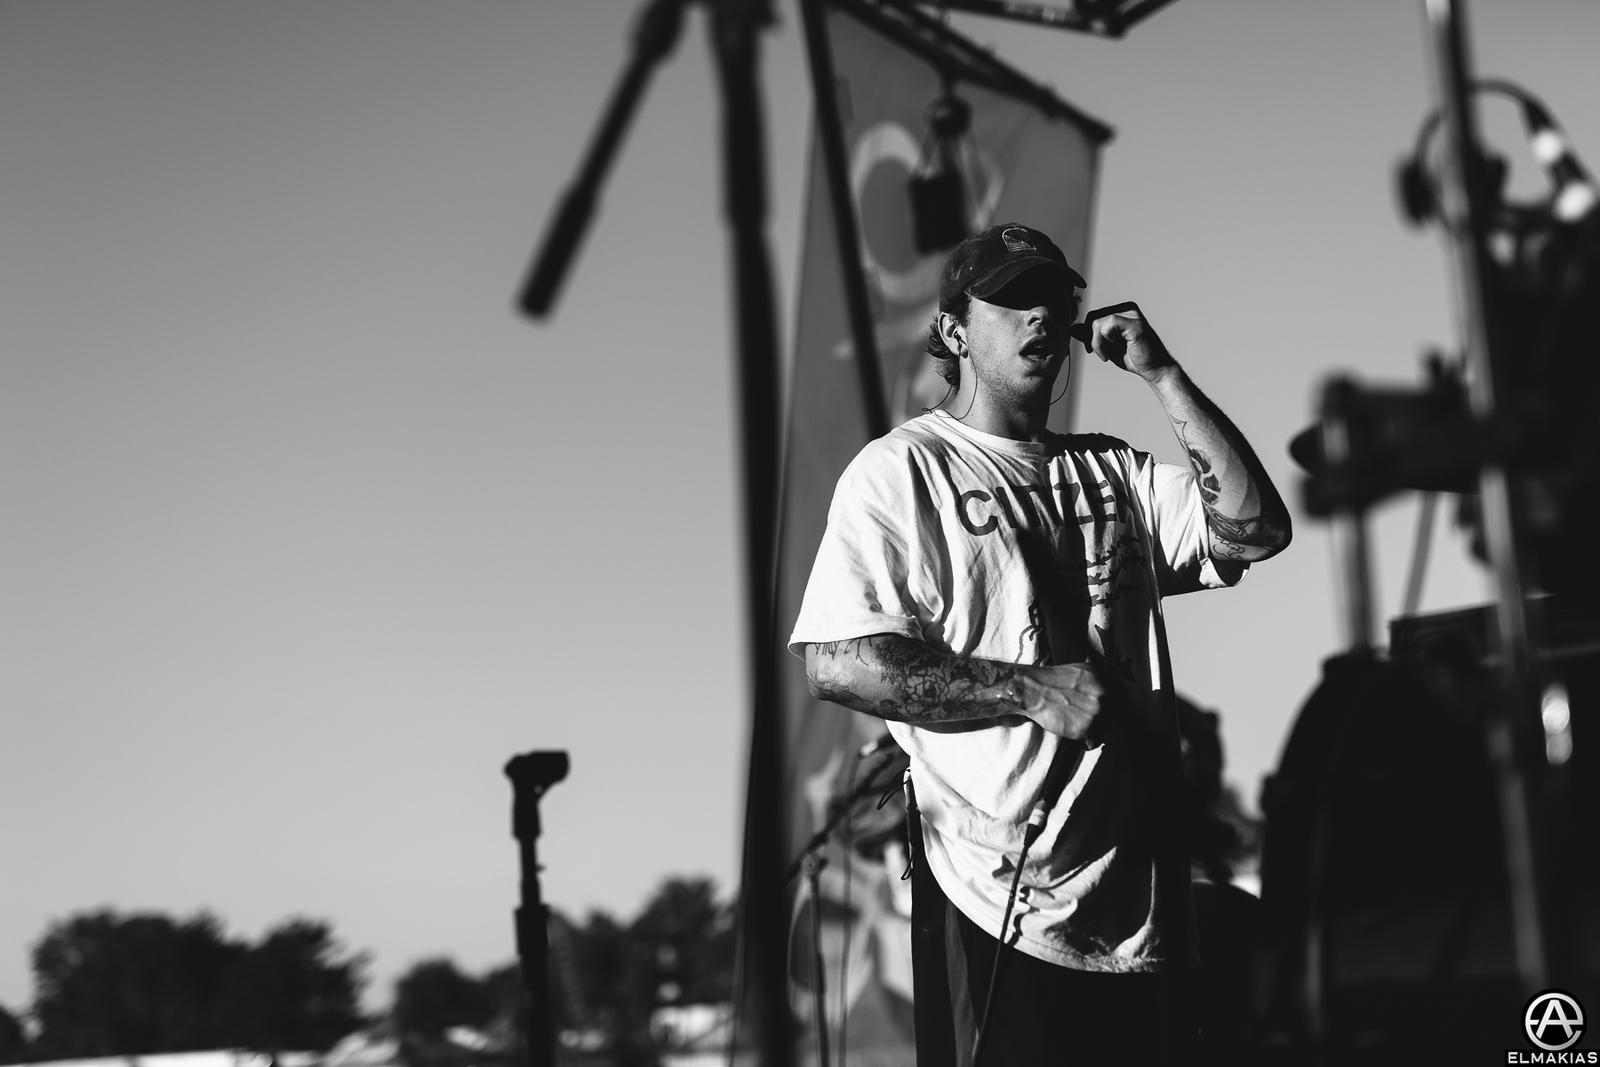 Mat Kerekes of Citizen live at Vans Warped Tour 2015 by Adam Elmakias